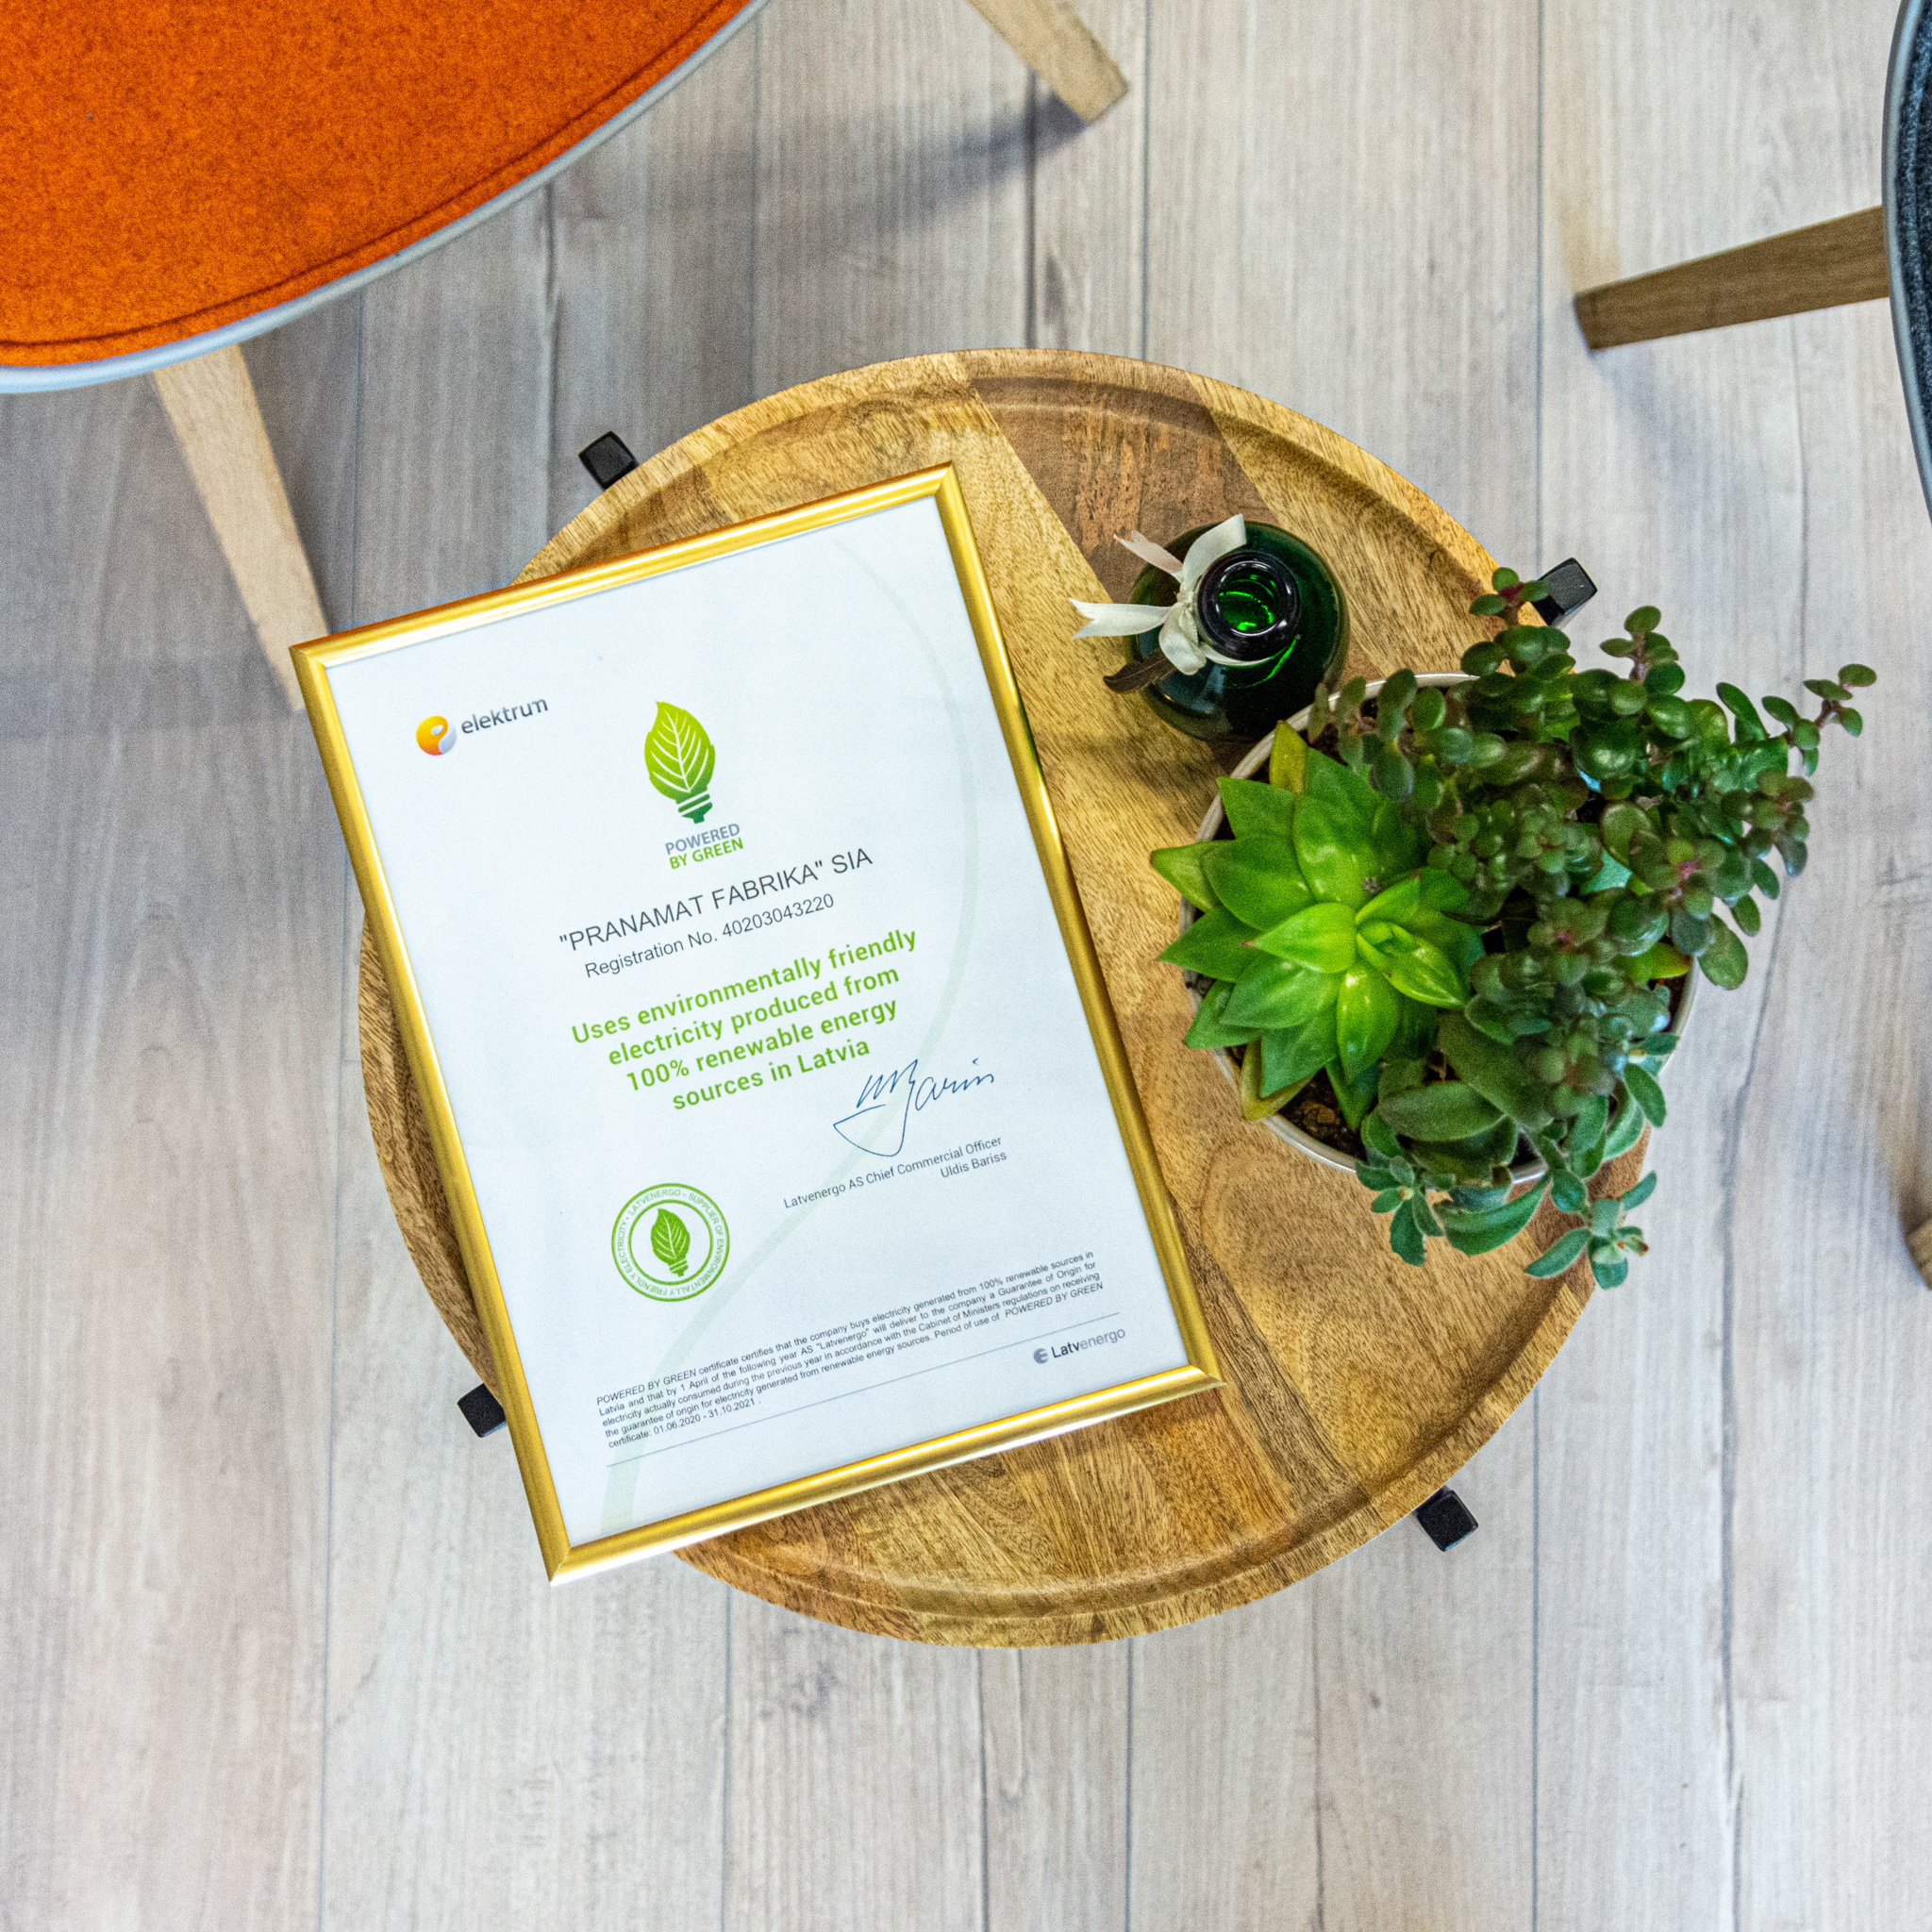 Handbuch aus Recyclingpapier